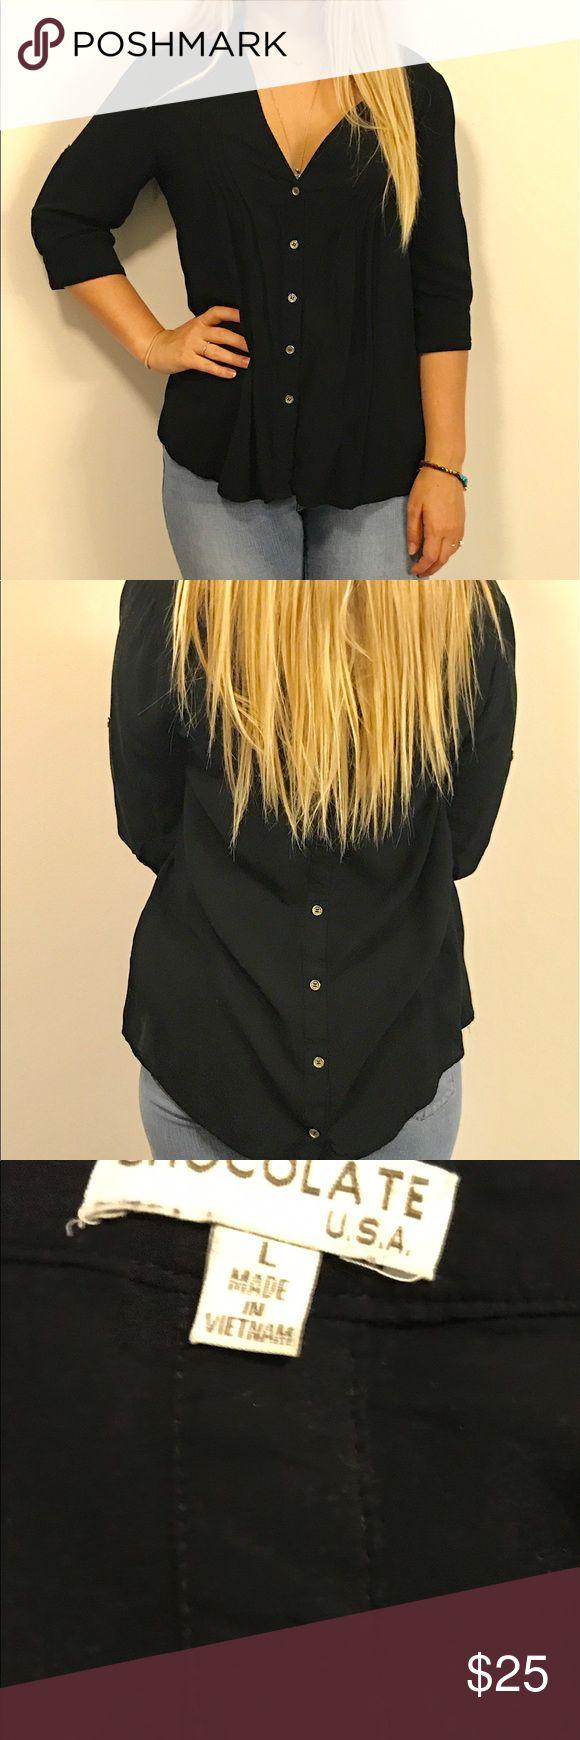 25 best ideas about black button up shirt on pinterest for V neck button up shirt